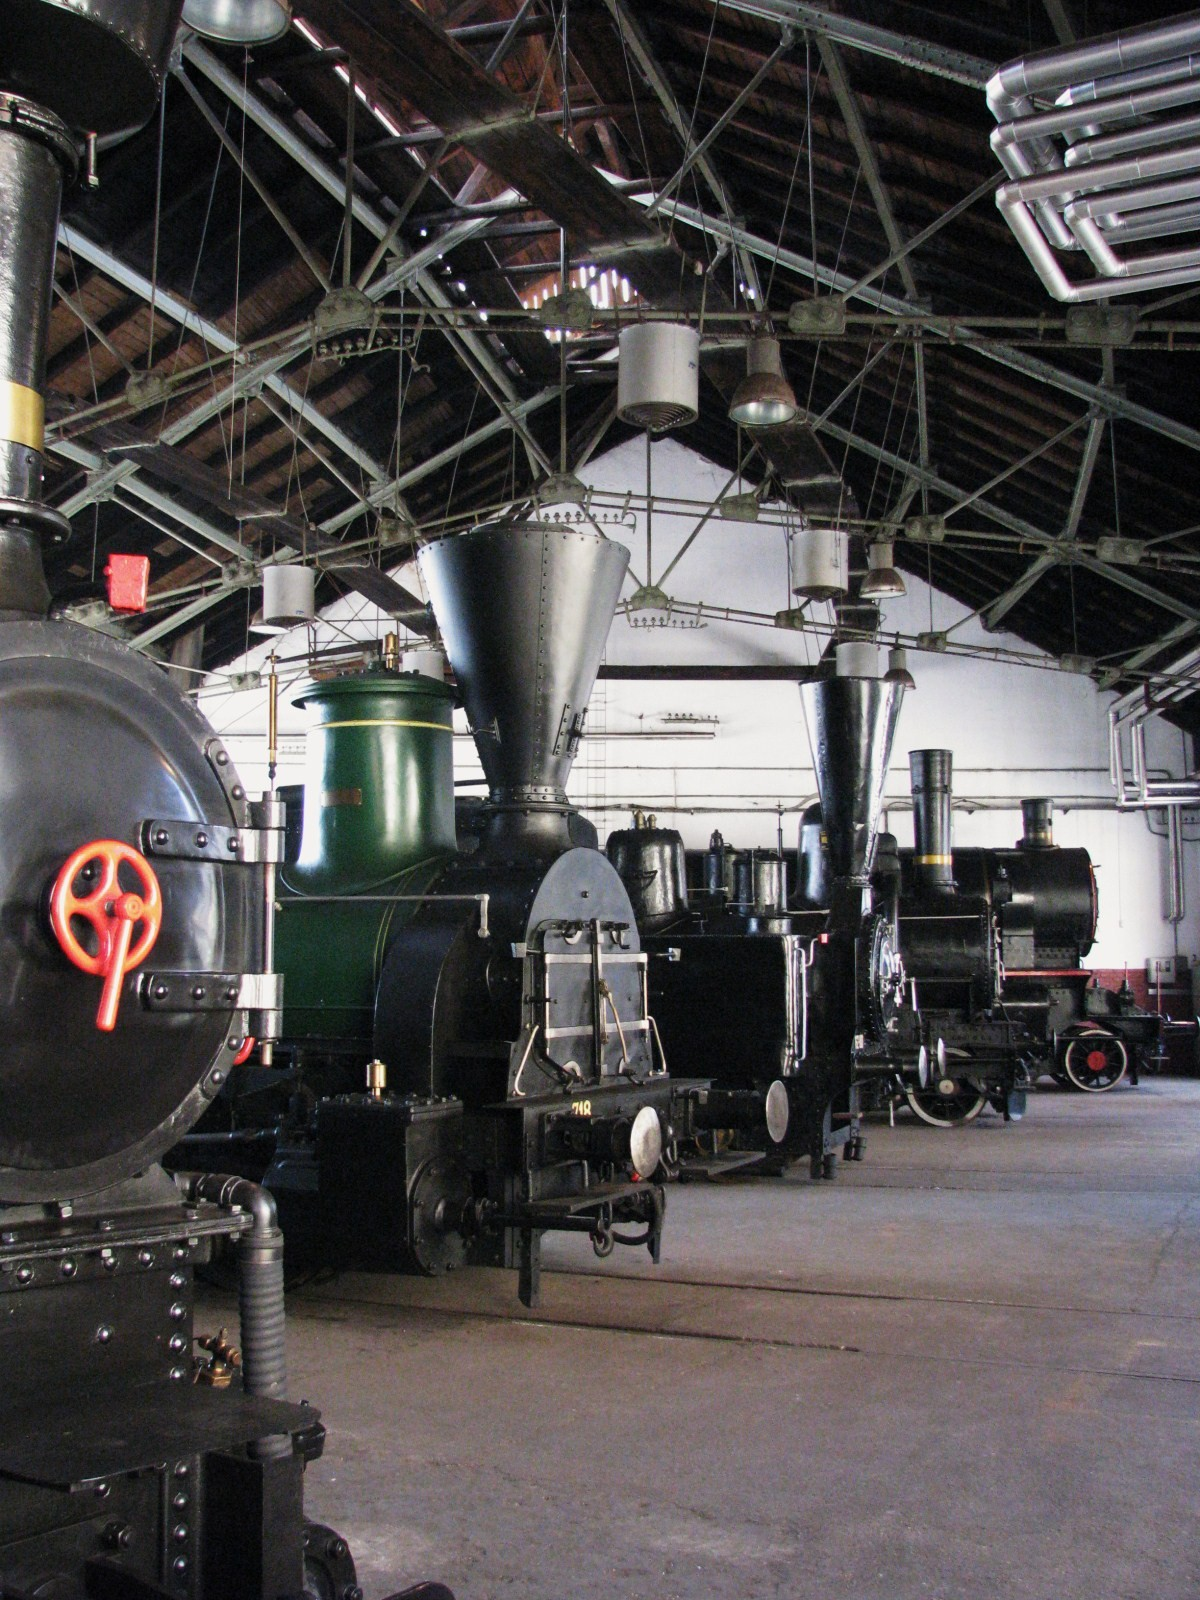 Slovenian Railway Museum